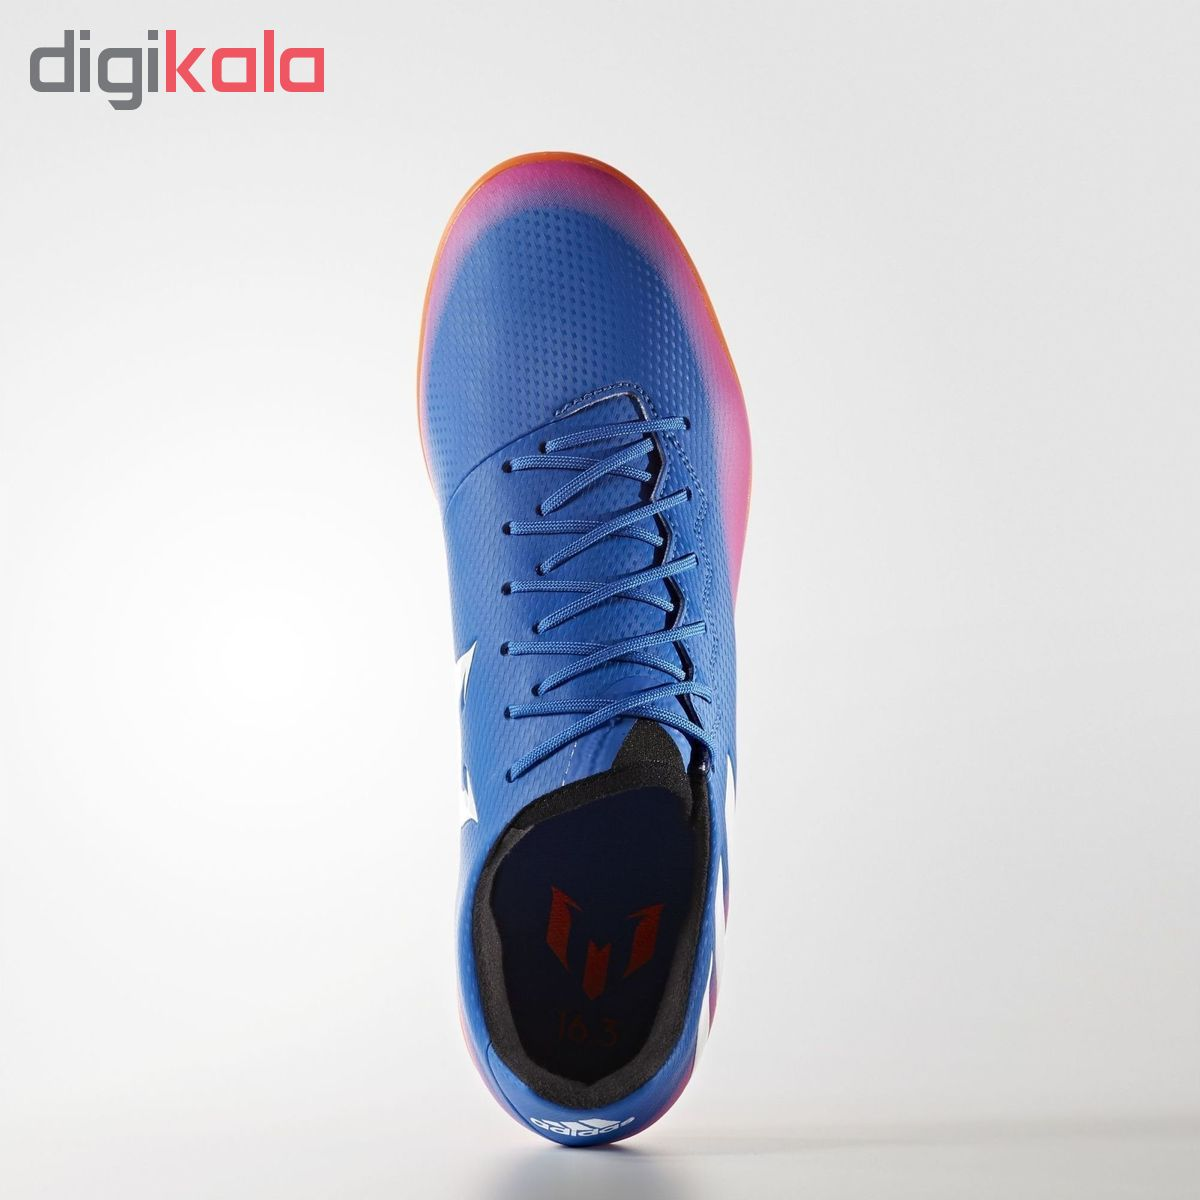 کفش فوتسال مردانه آدیداس مدل Messi 16.3 کد BA9018